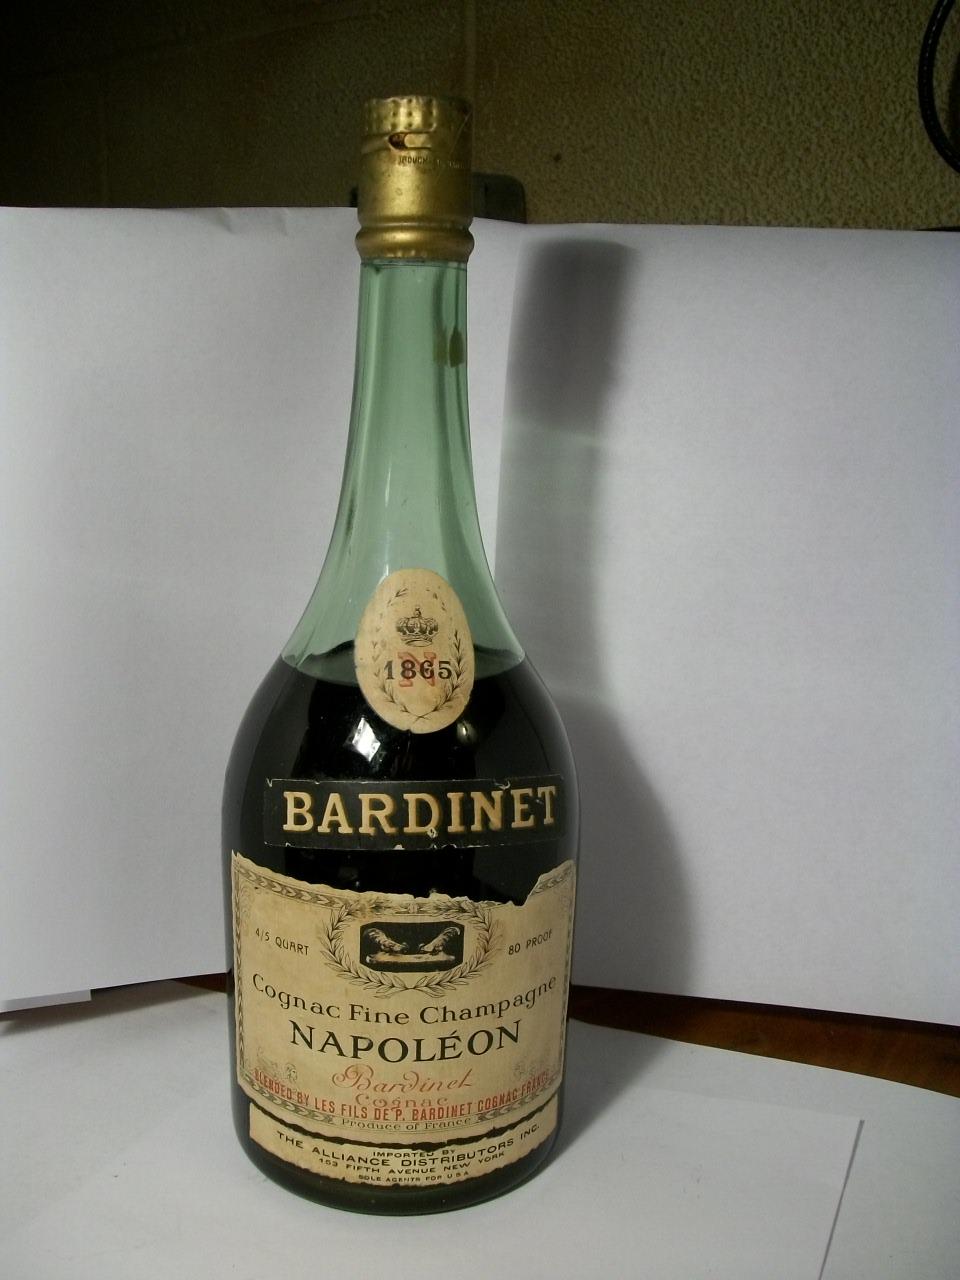 Bardinet Napoleon